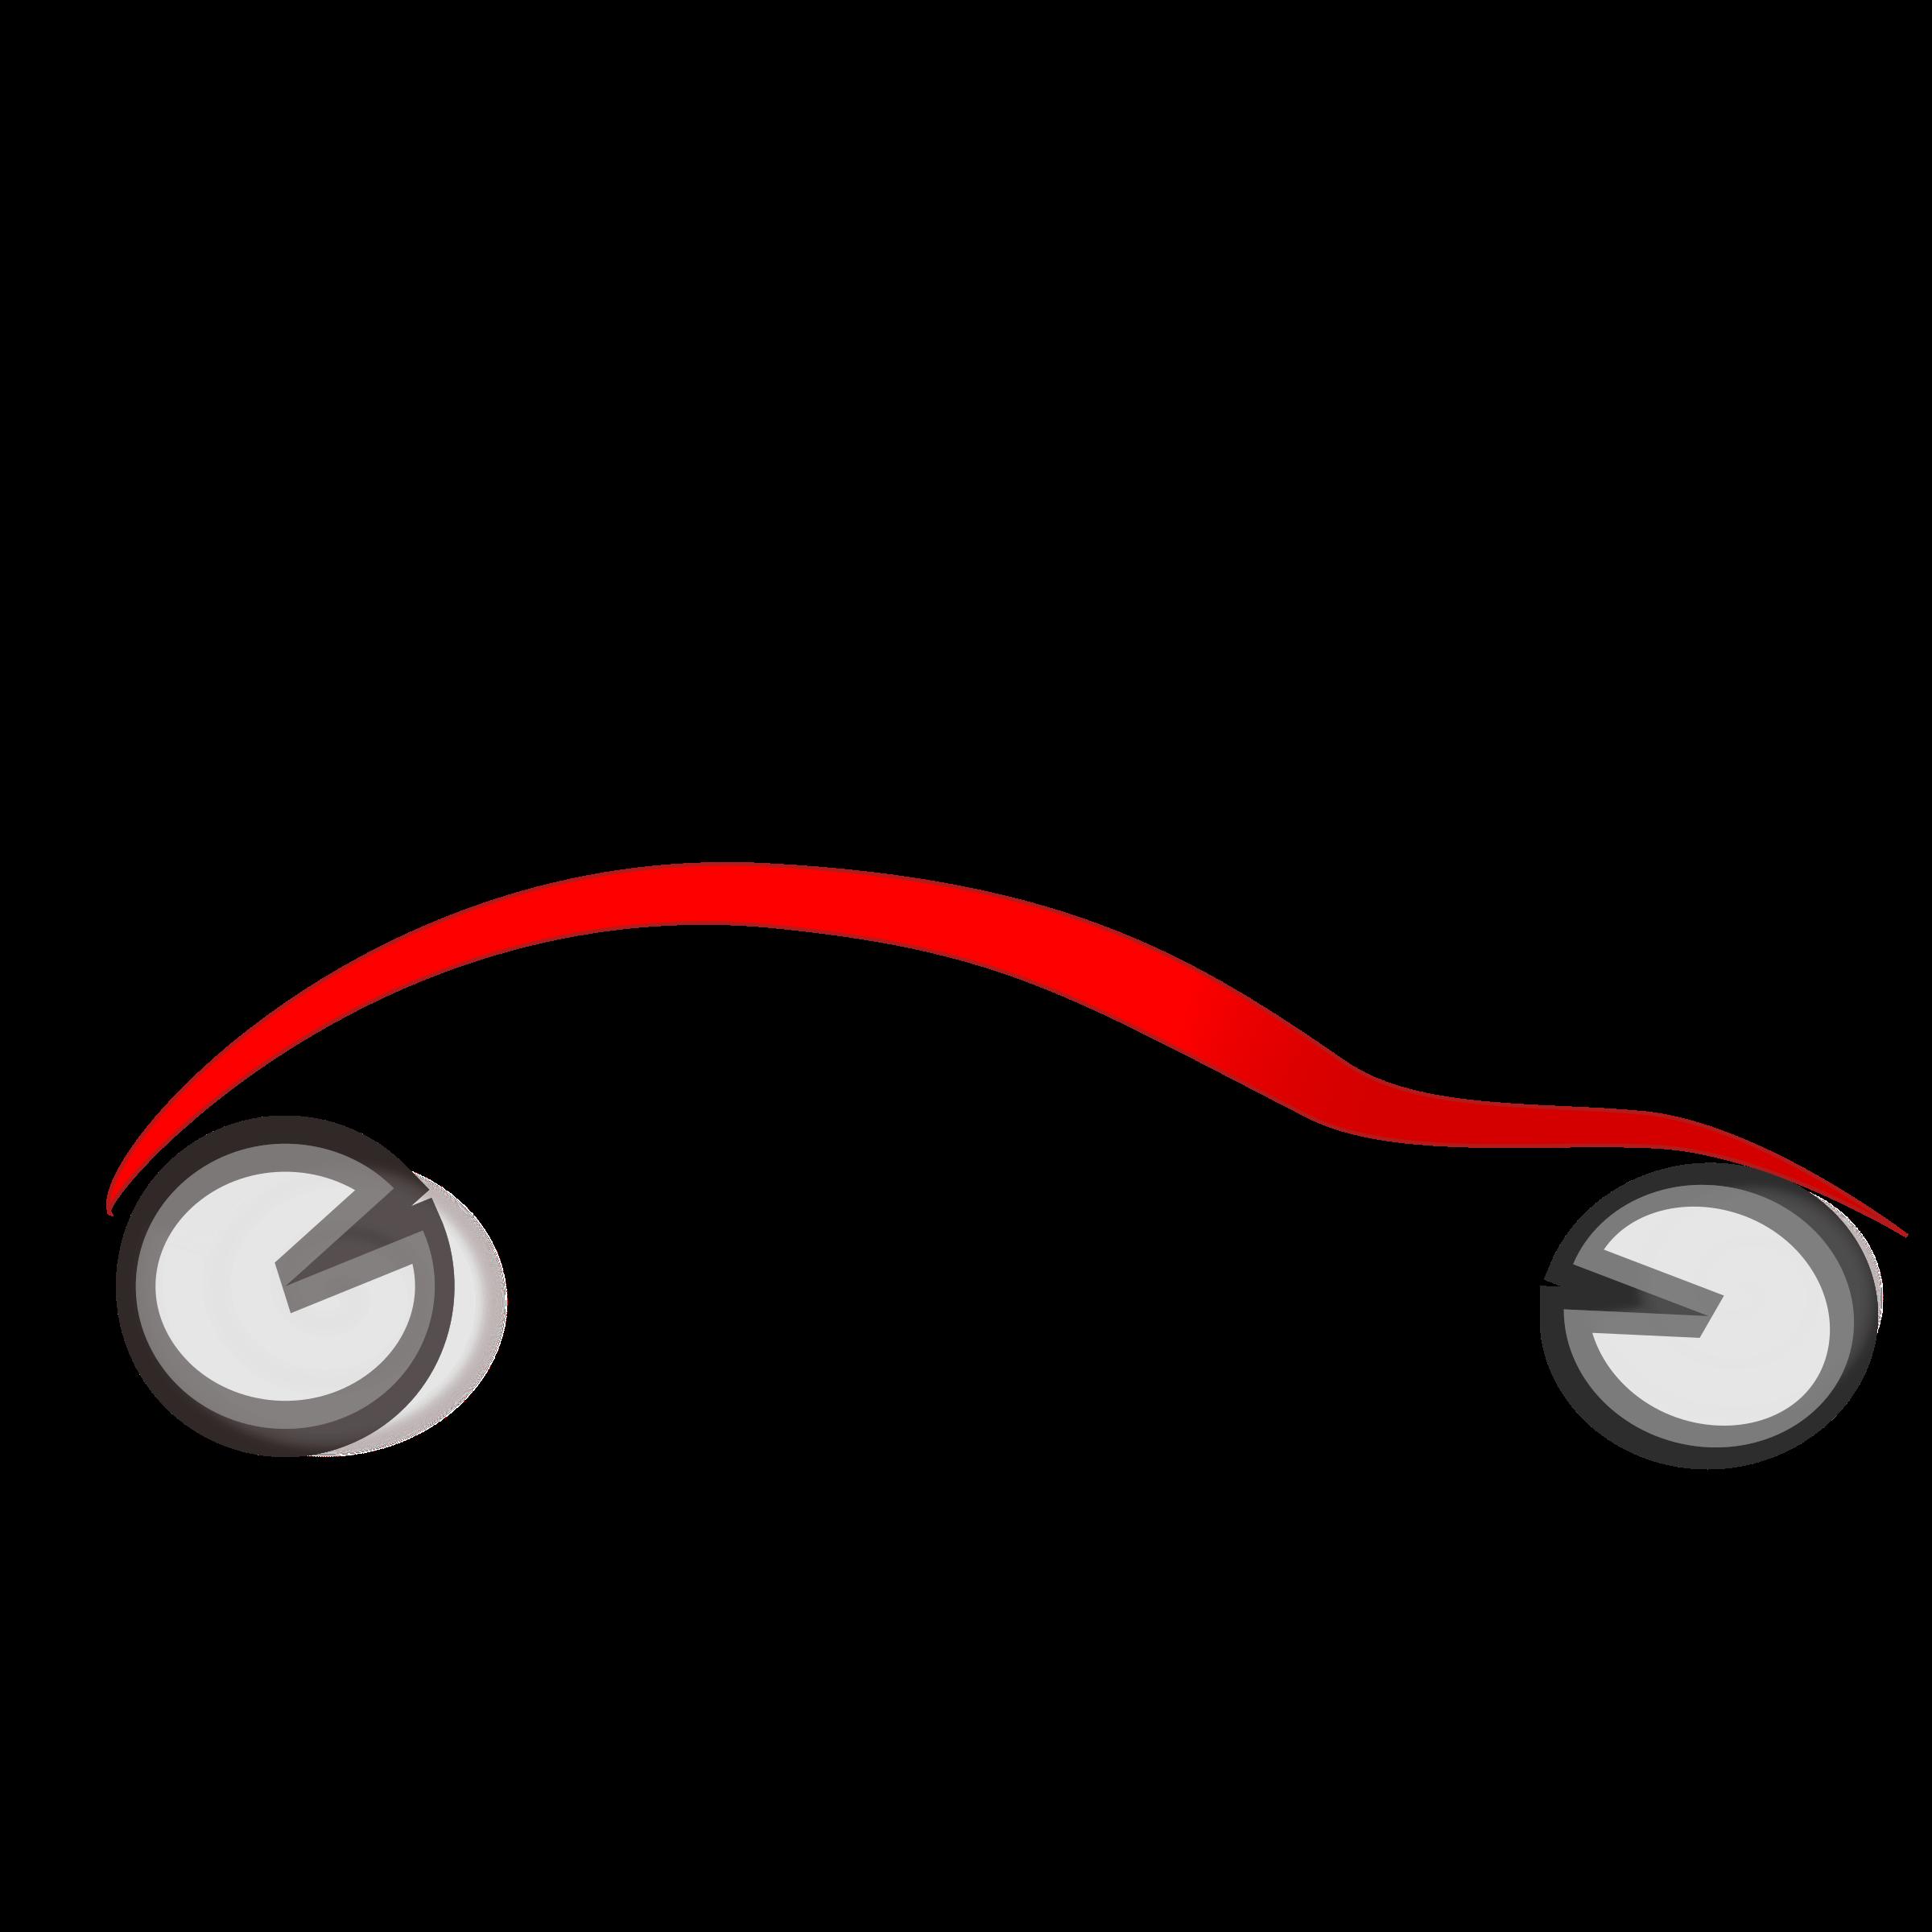 Netalloy logo big image. Clipart car outline